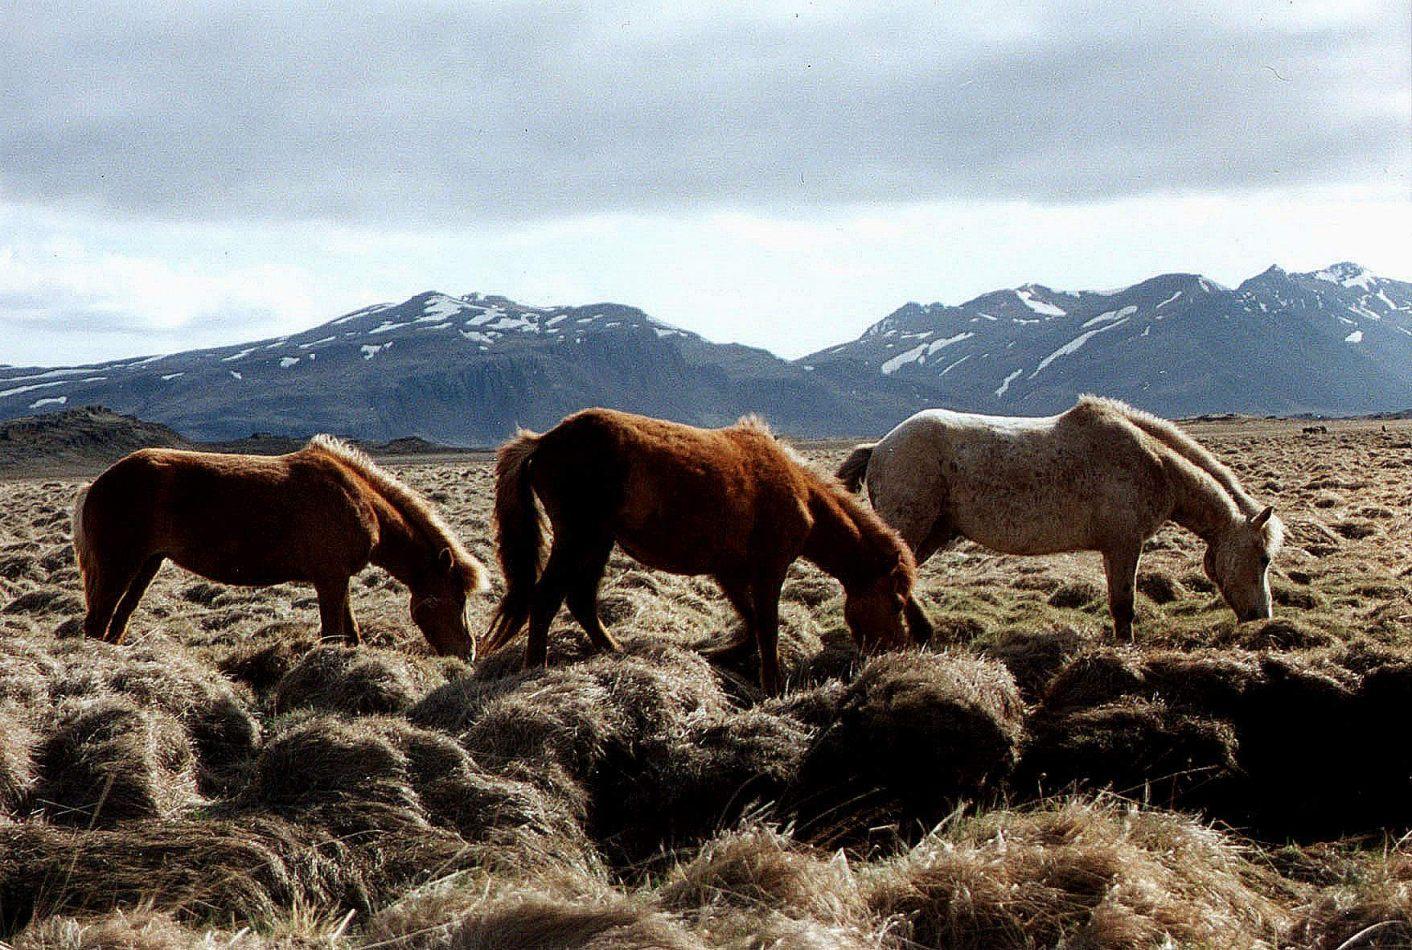 Anthony Ellis Photography: From the North - Icelandic Horses